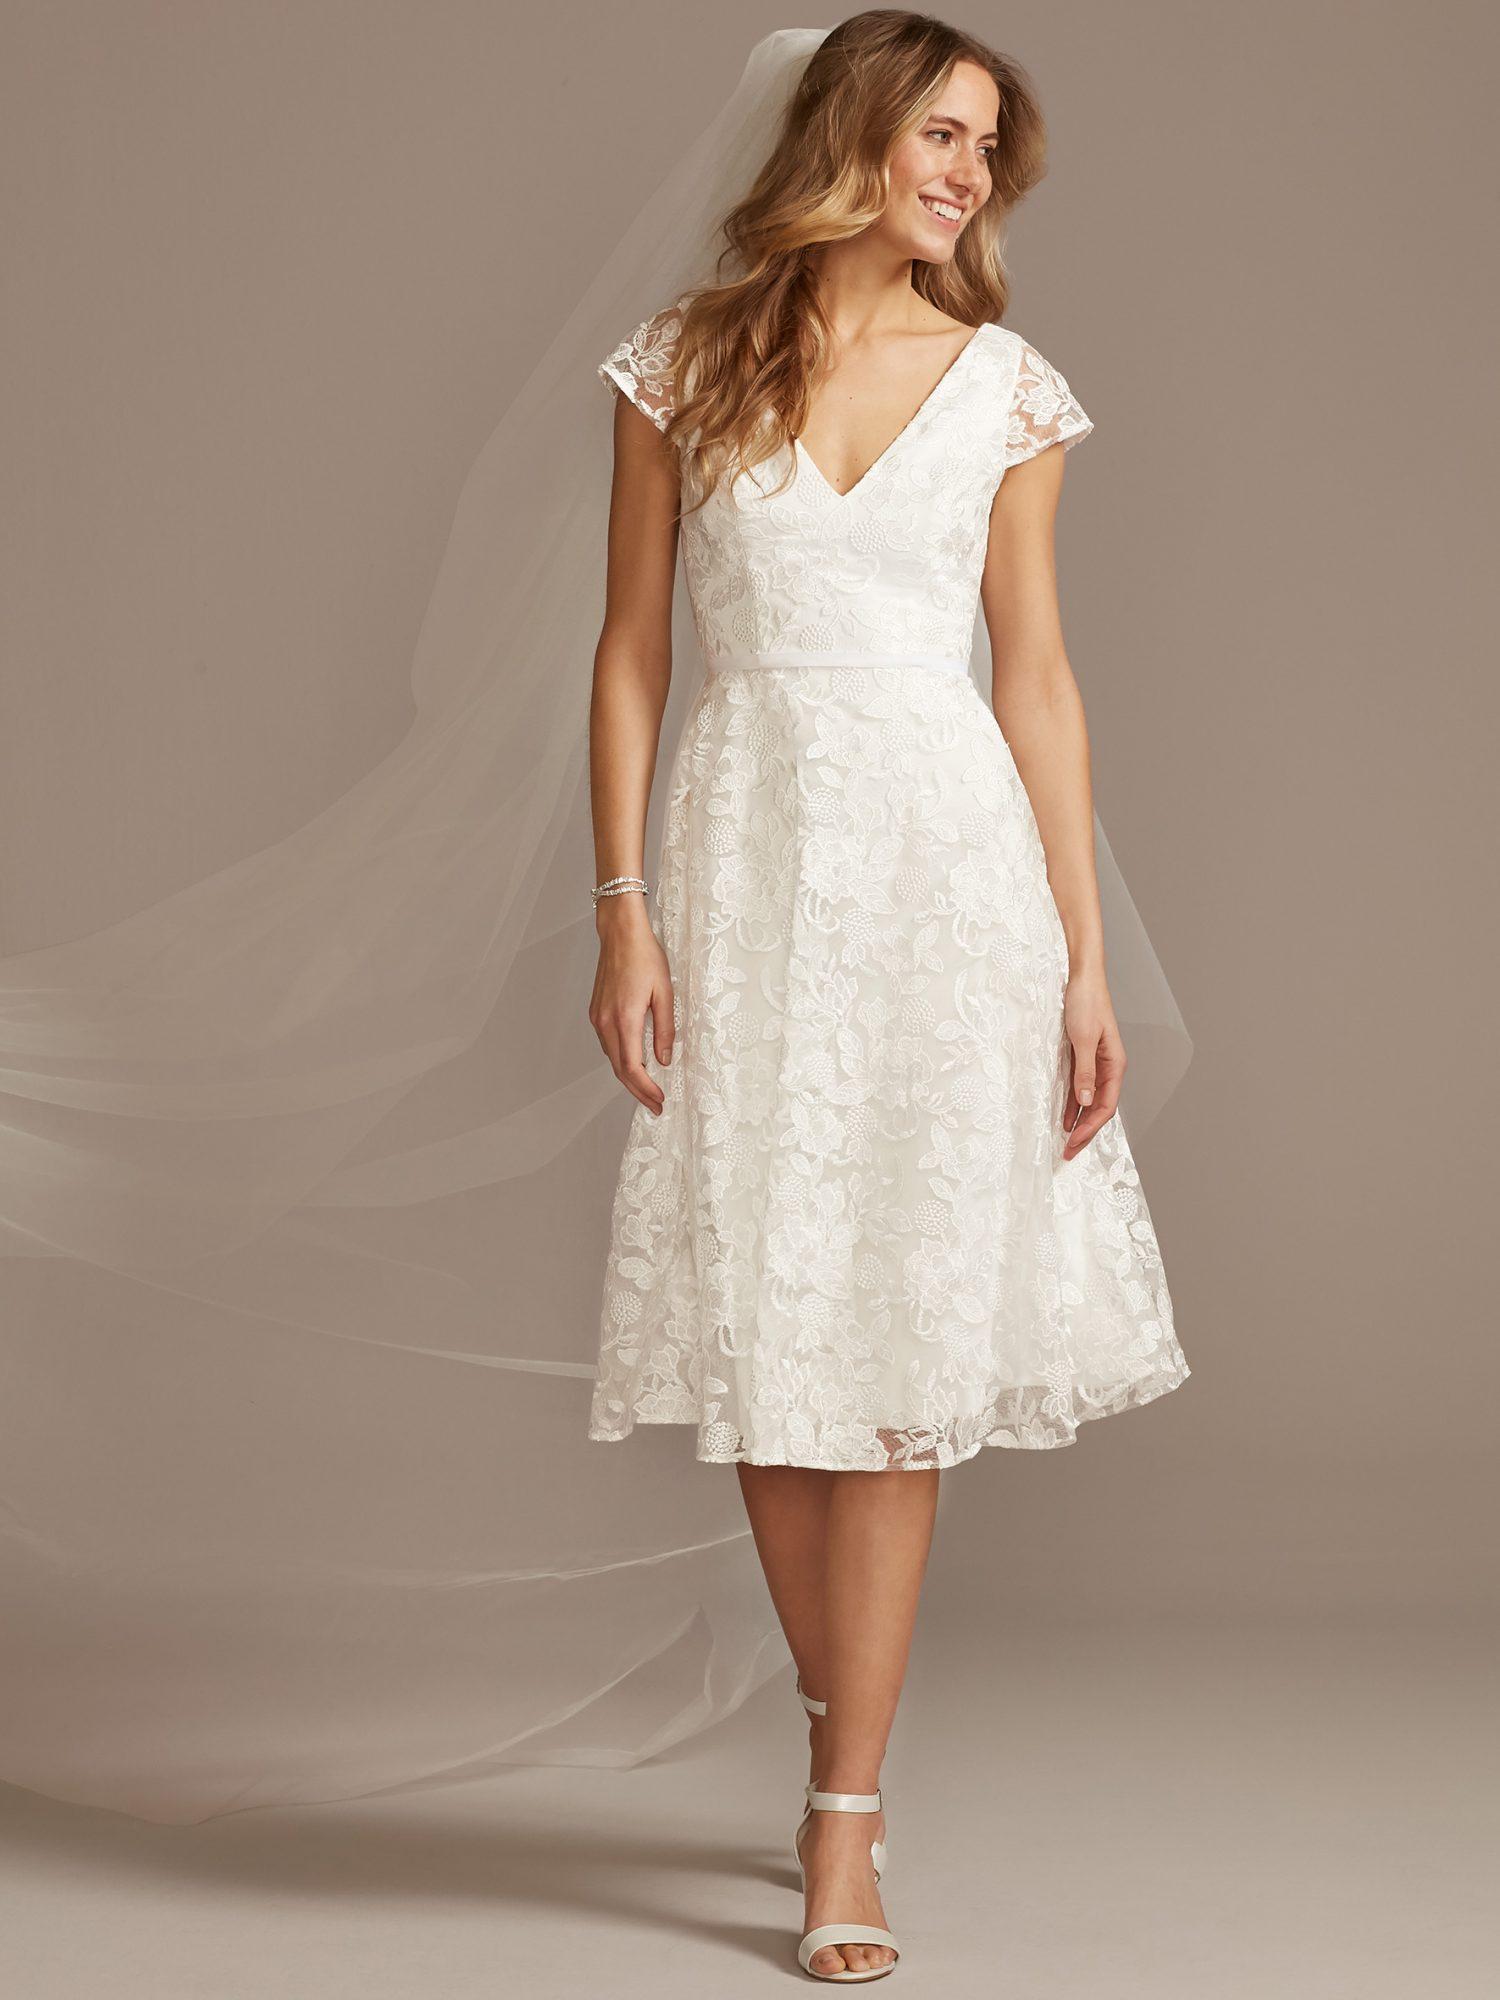 davids bridal knee-length cap sleeve wedding dress spring 2021